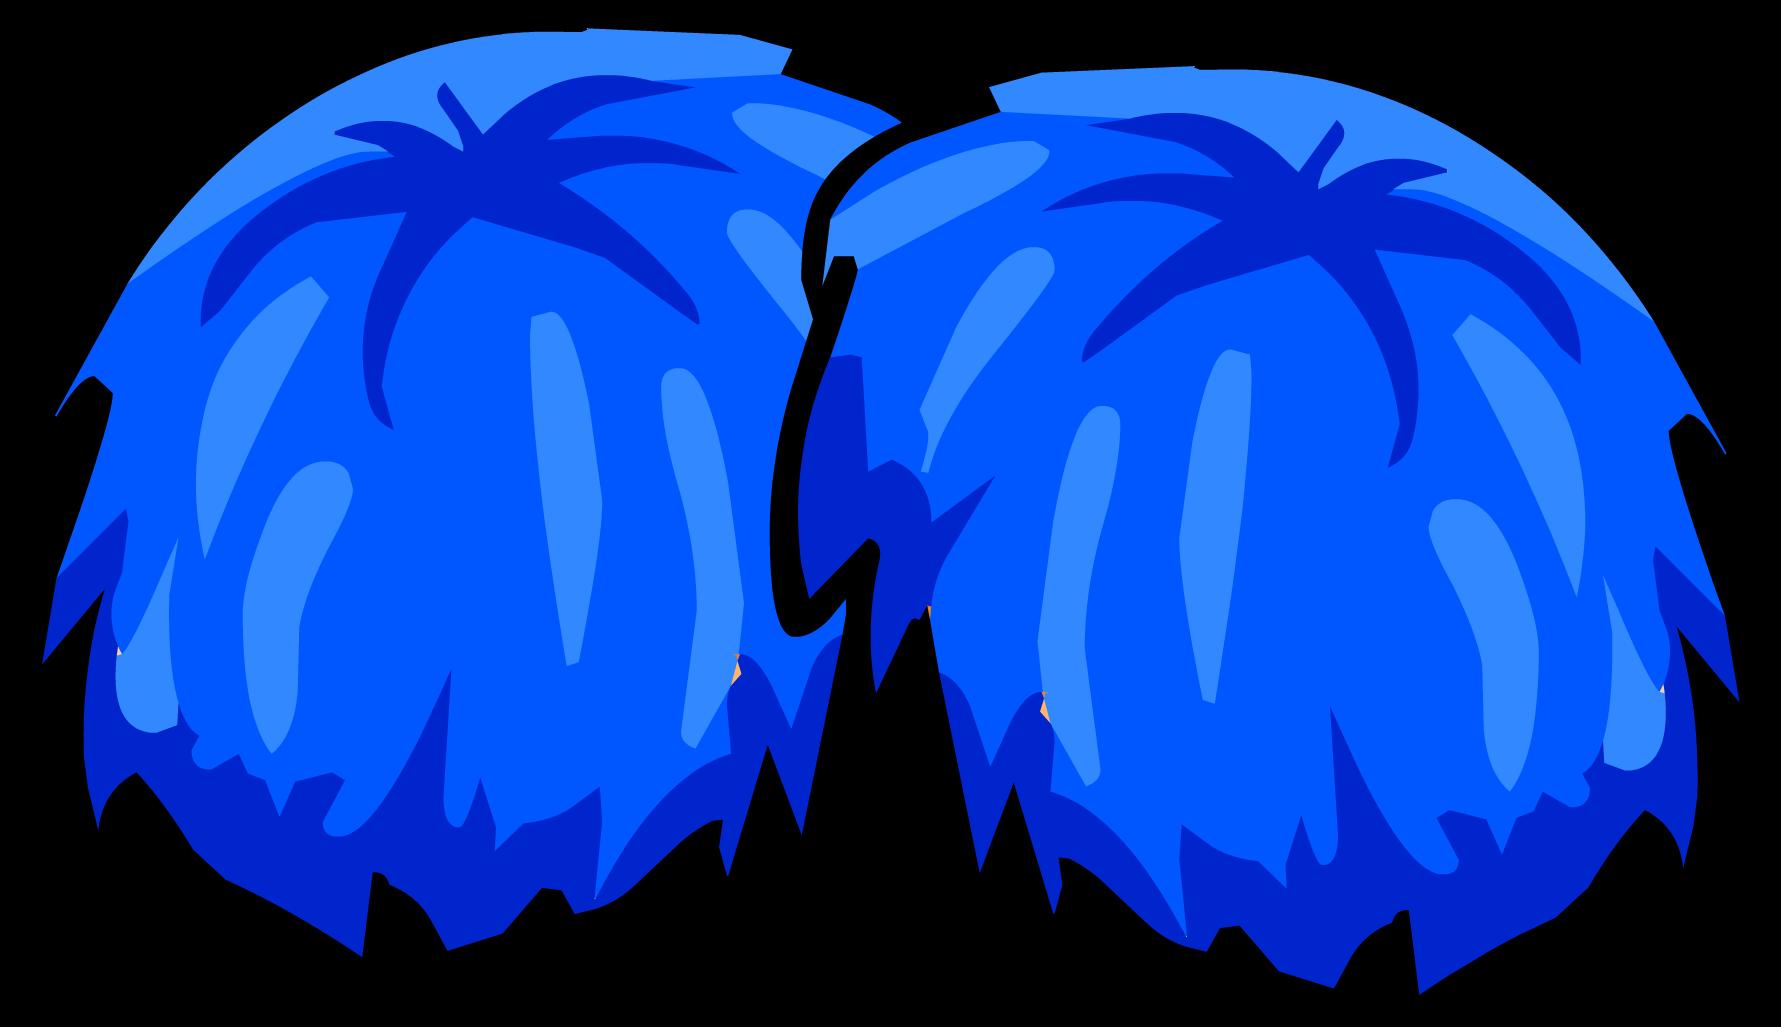 1781x1027 Blue Pom Poms Clipart